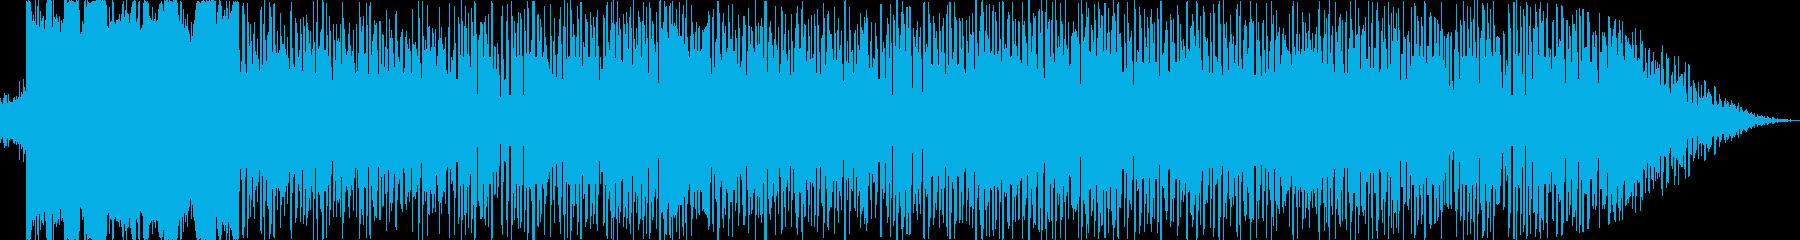 8bit風チューン(はじまり・ワクワク)の再生済みの波形